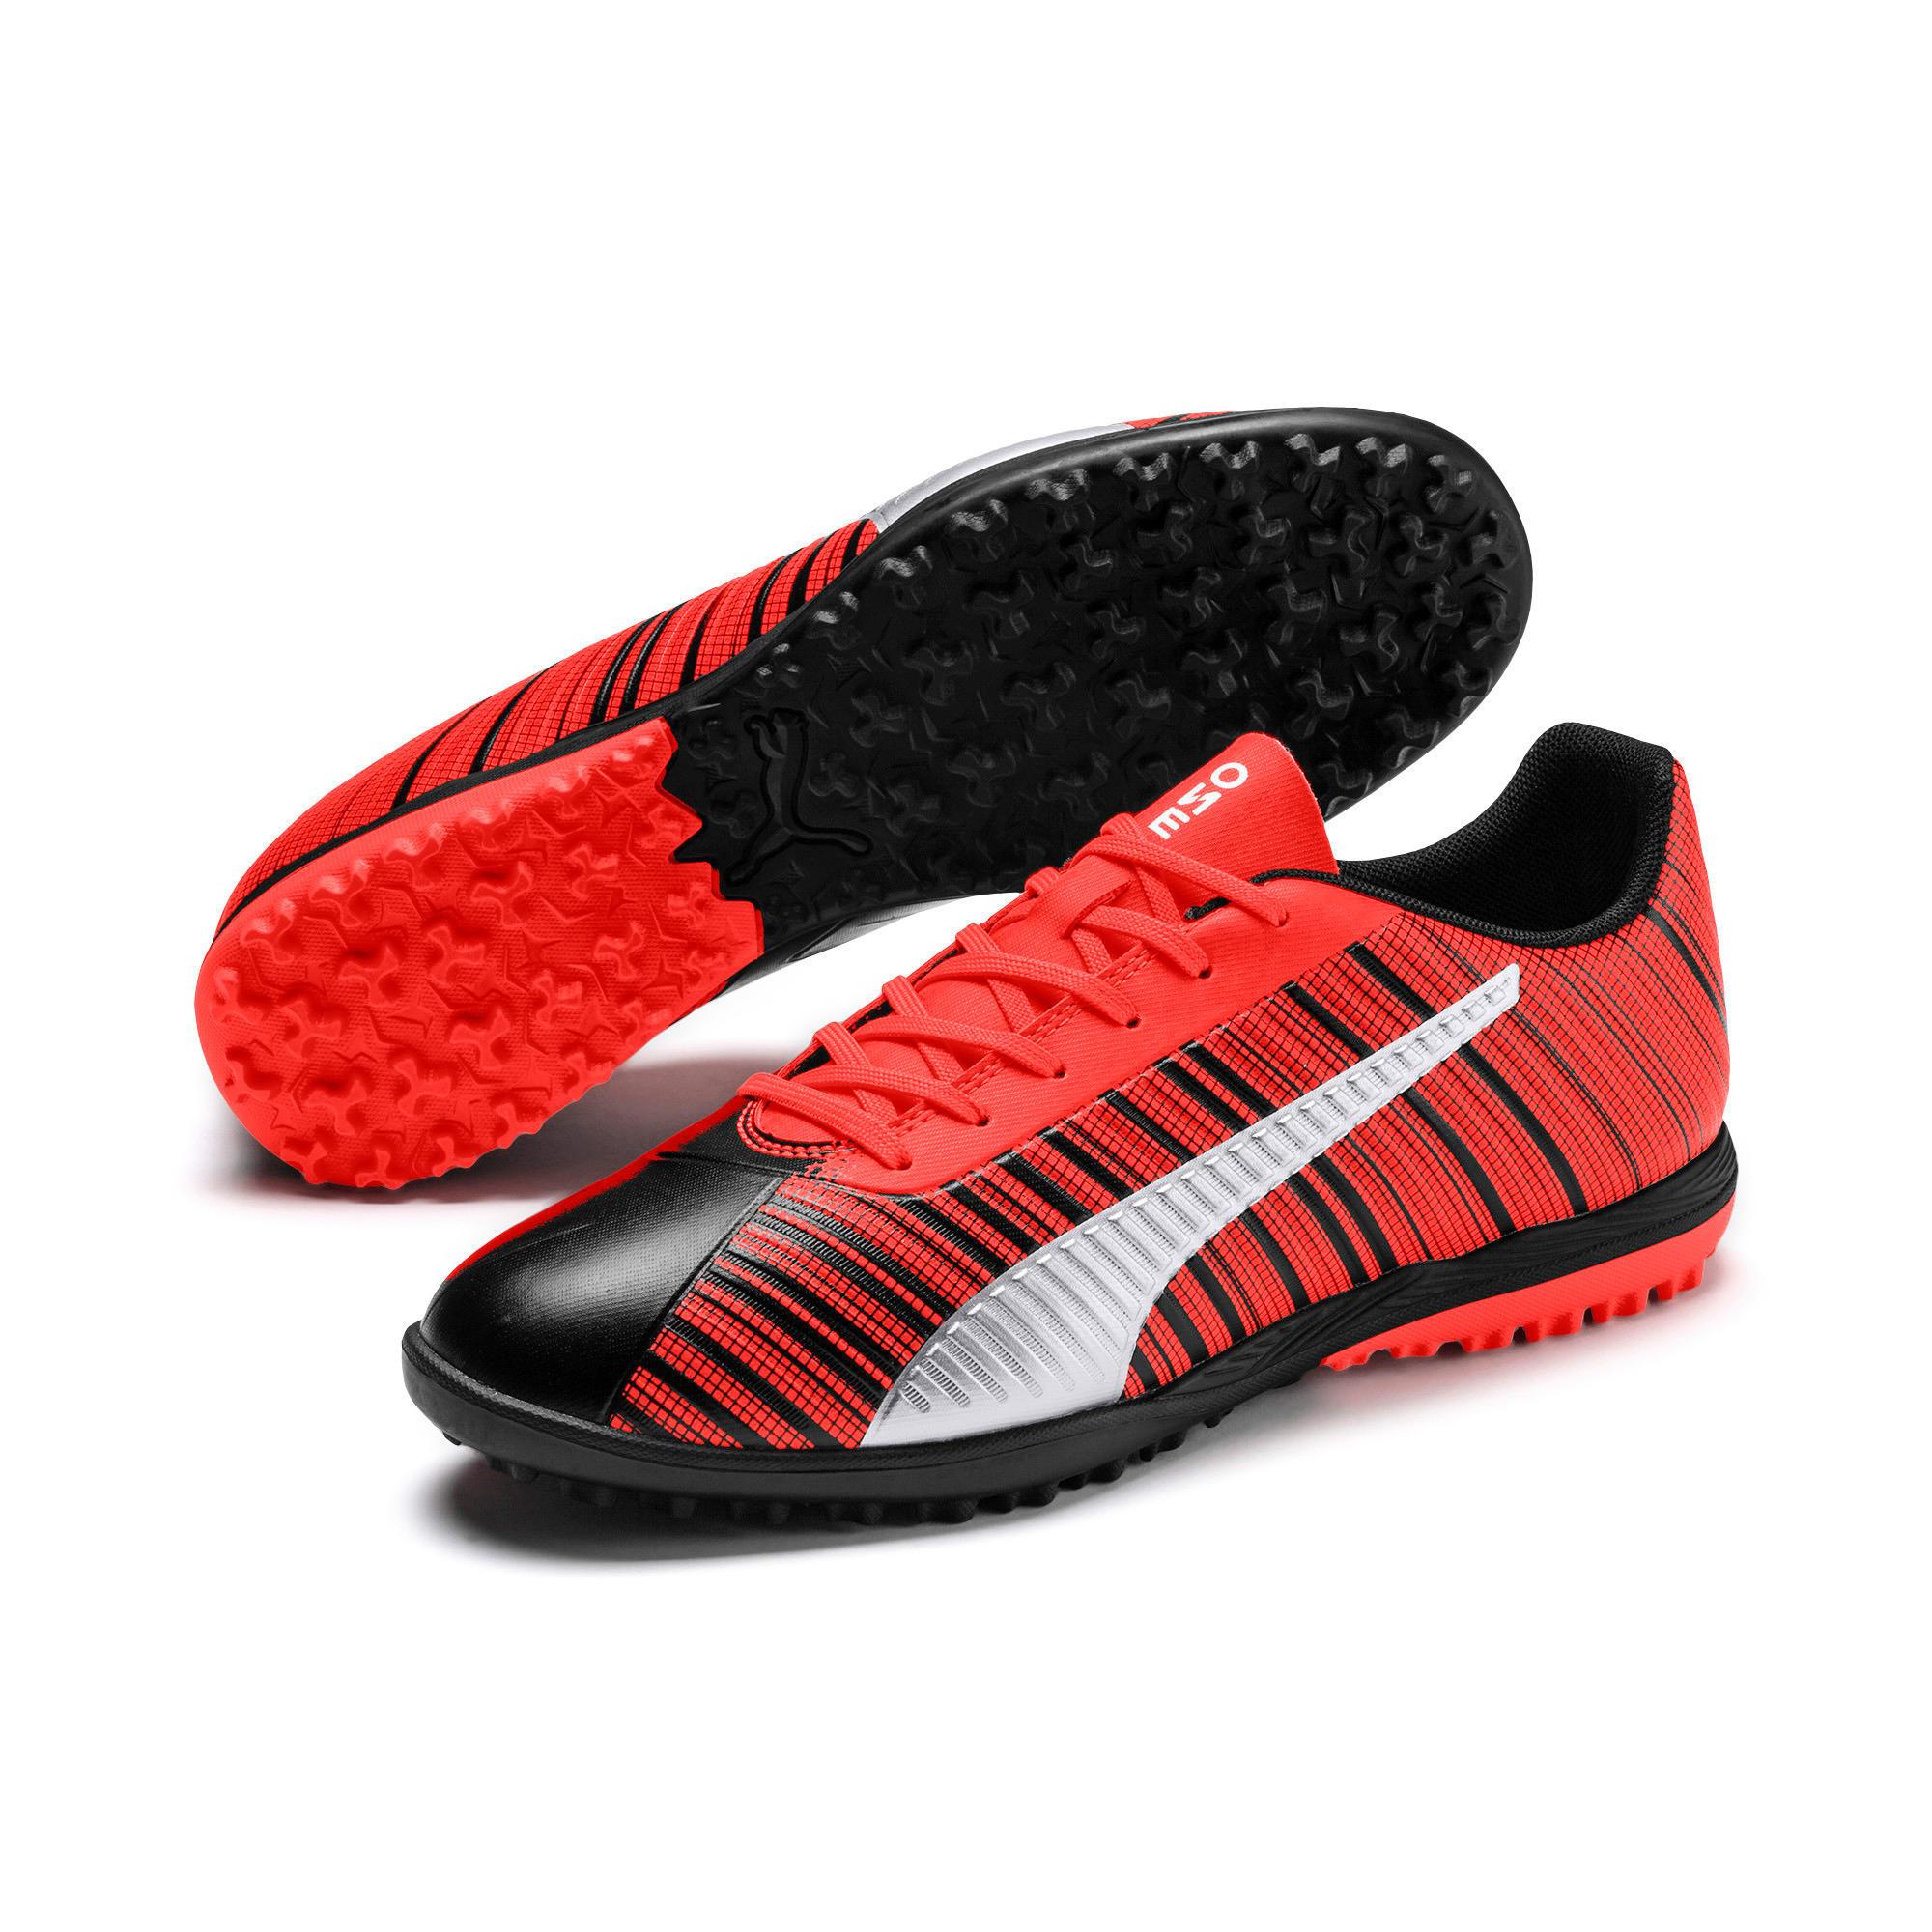 Thumbnail 3 of PUMA ONE 5.4 TT Men's Football Boots, Black-Nrgy Red-Aged Silver, medium